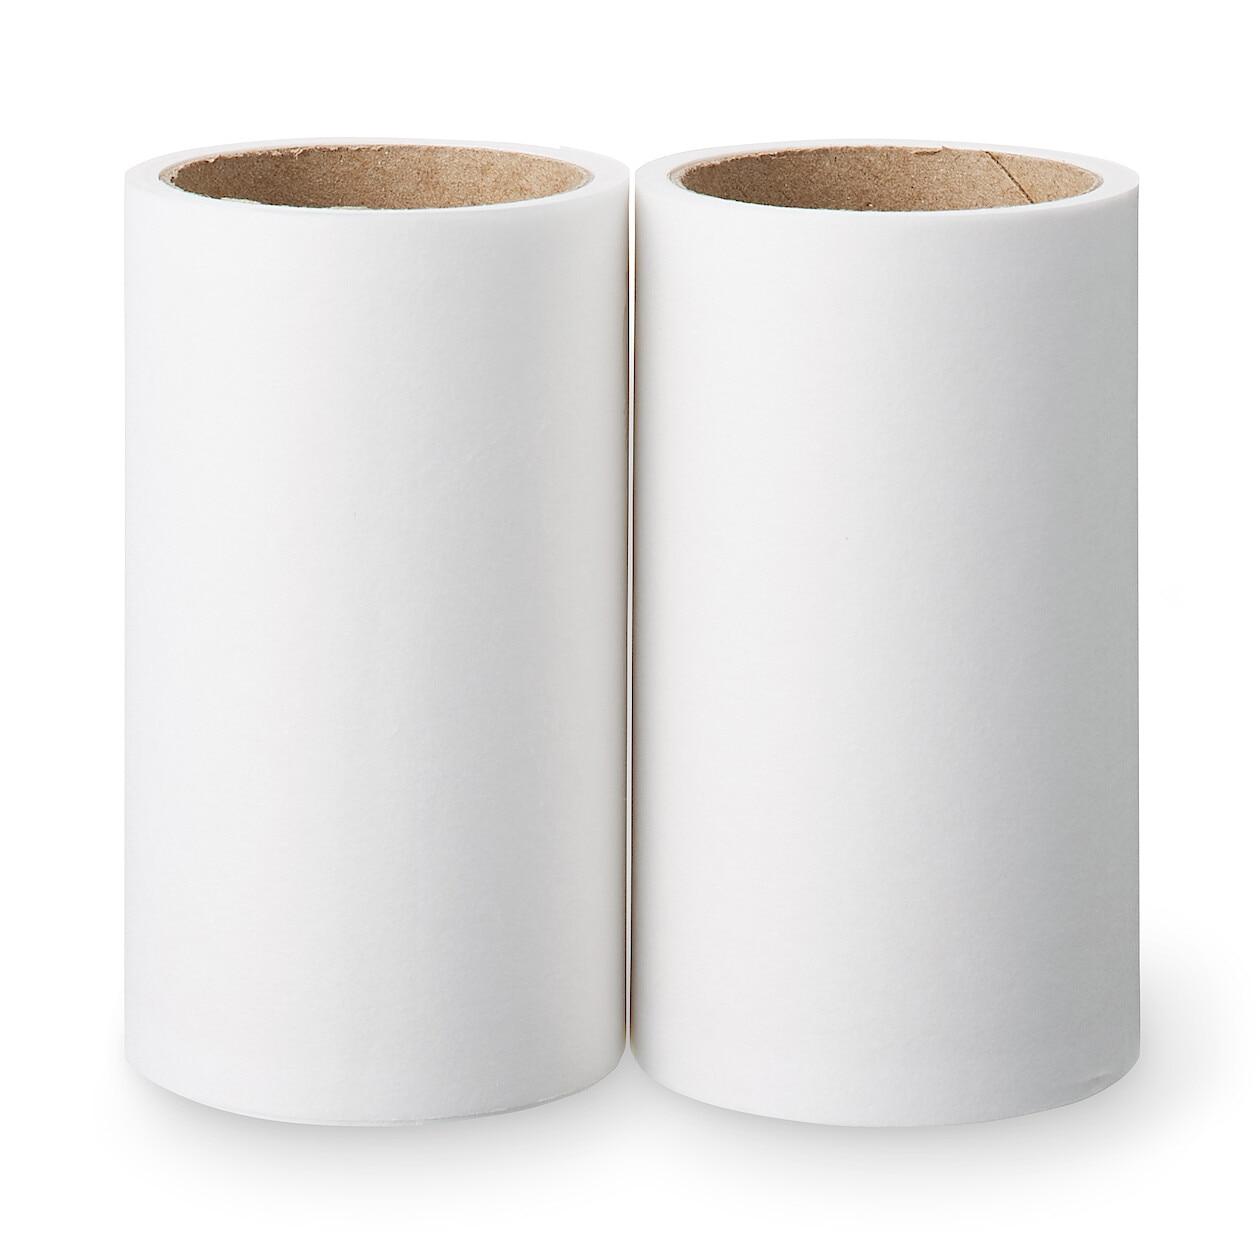 RoomClip商品情報 - 衣類用クリーナー用替えテープ